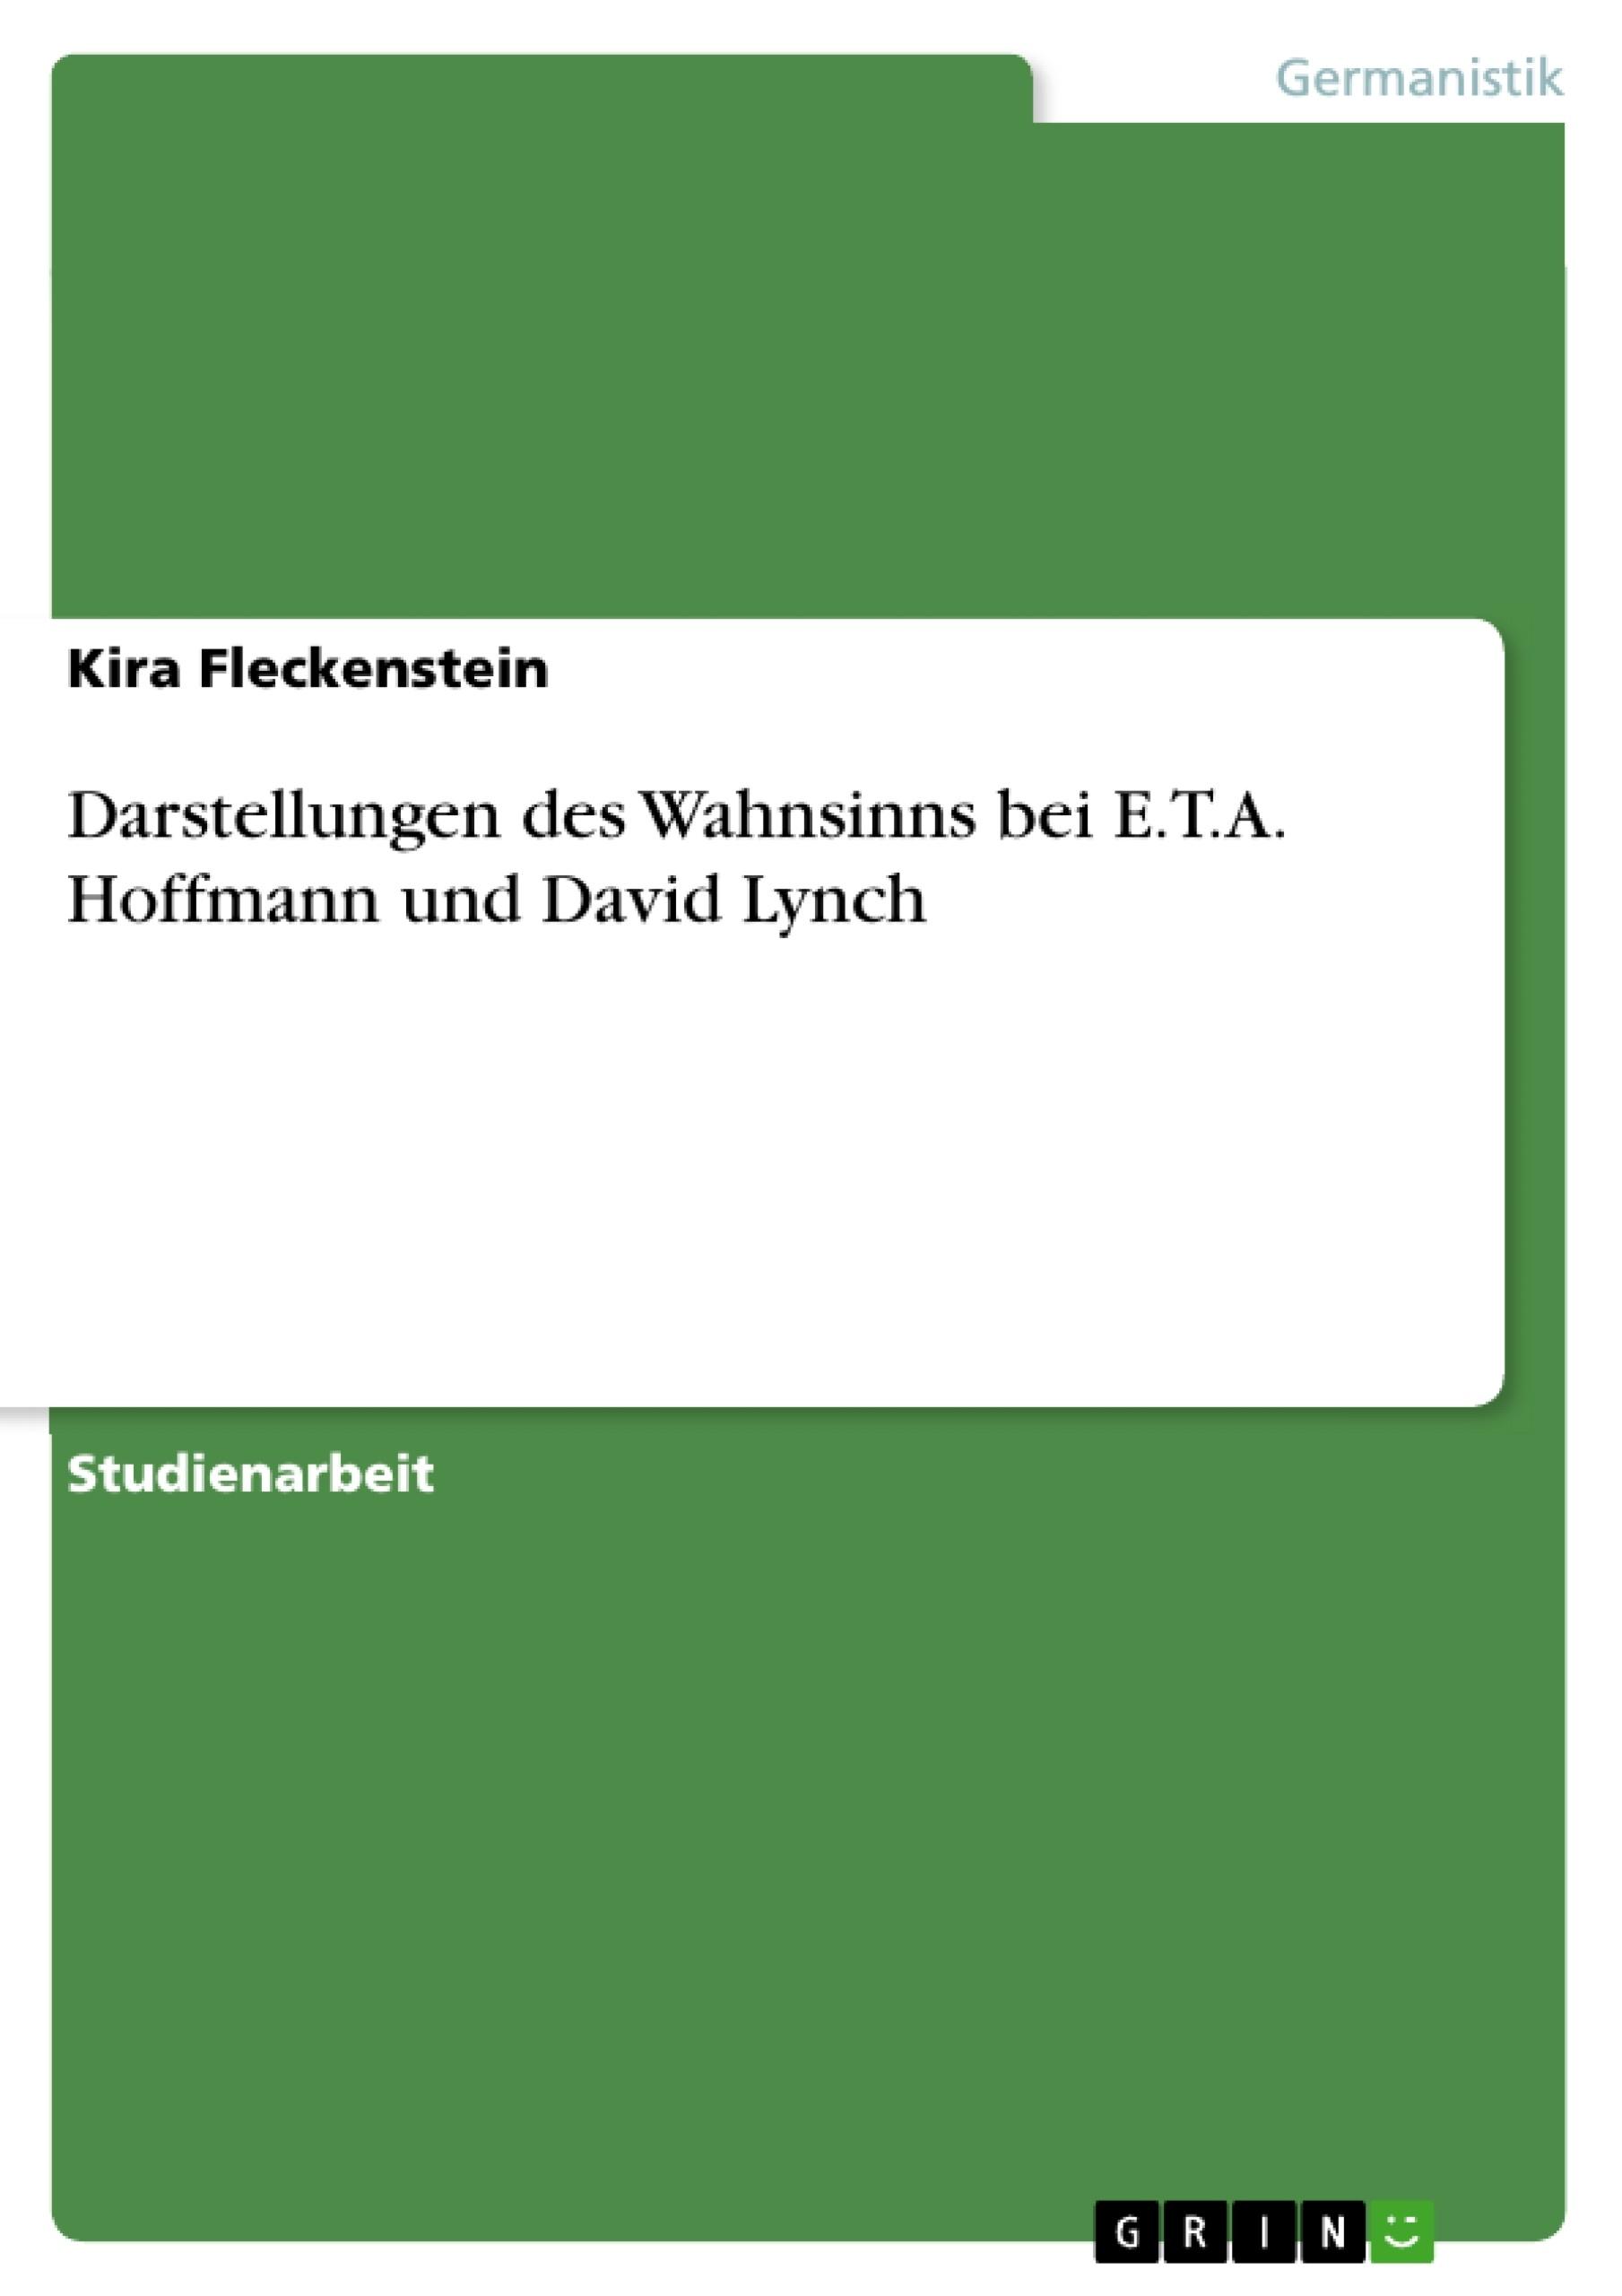 Titel: Darstellungen des Wahnsinns bei E.T.A. Hoffmann und David Lynch